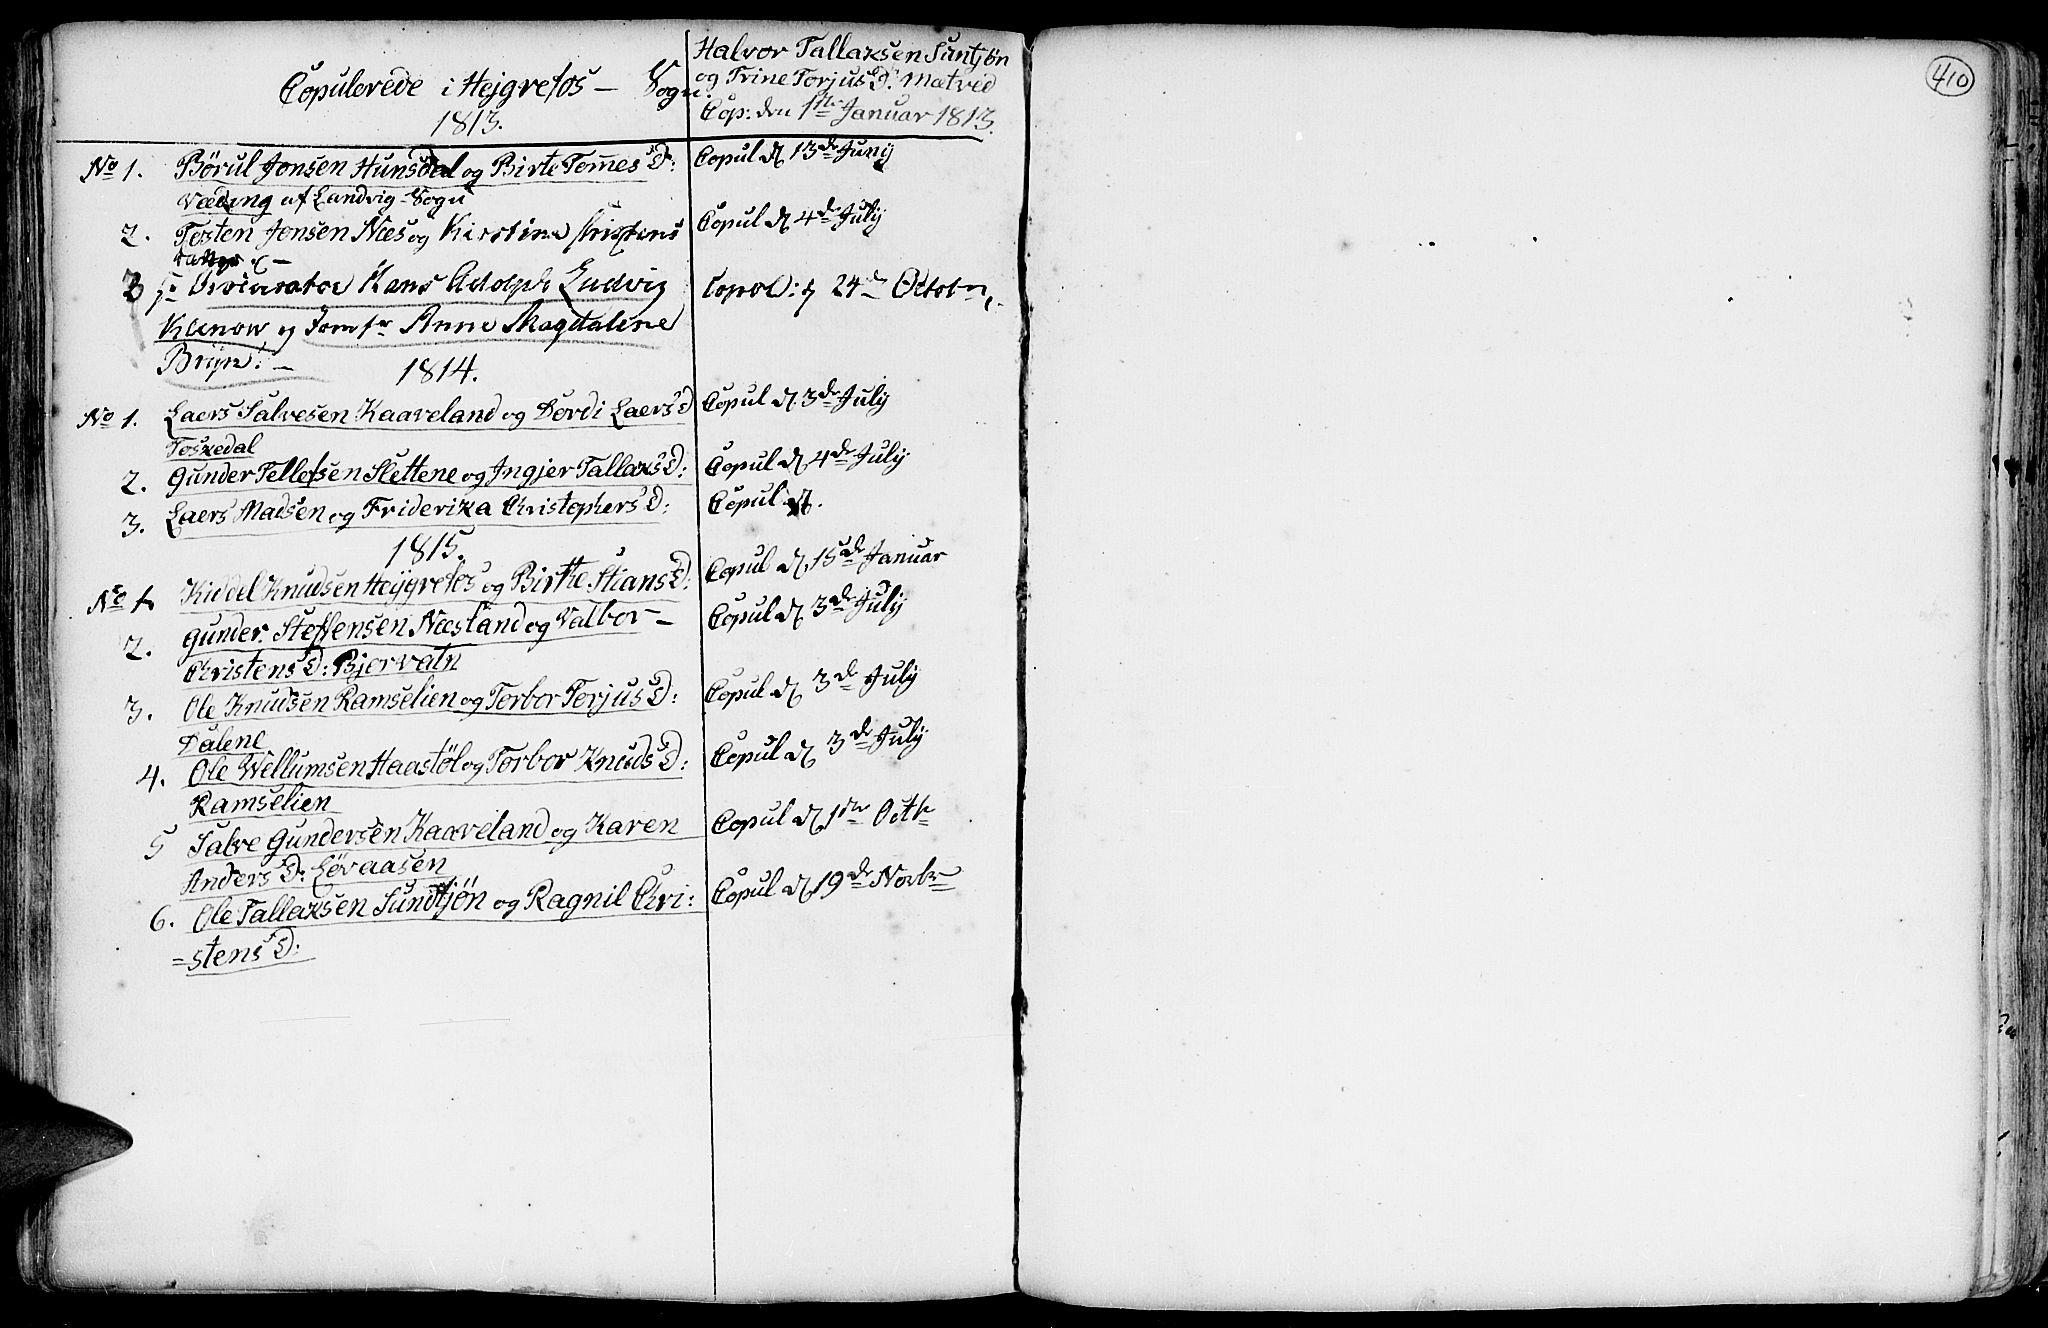 SAK, Hommedal sokneprestkontor, F/Fa/Fab/L0002: Ministerialbok nr. A 2 /3, 1740-1821, s. 410